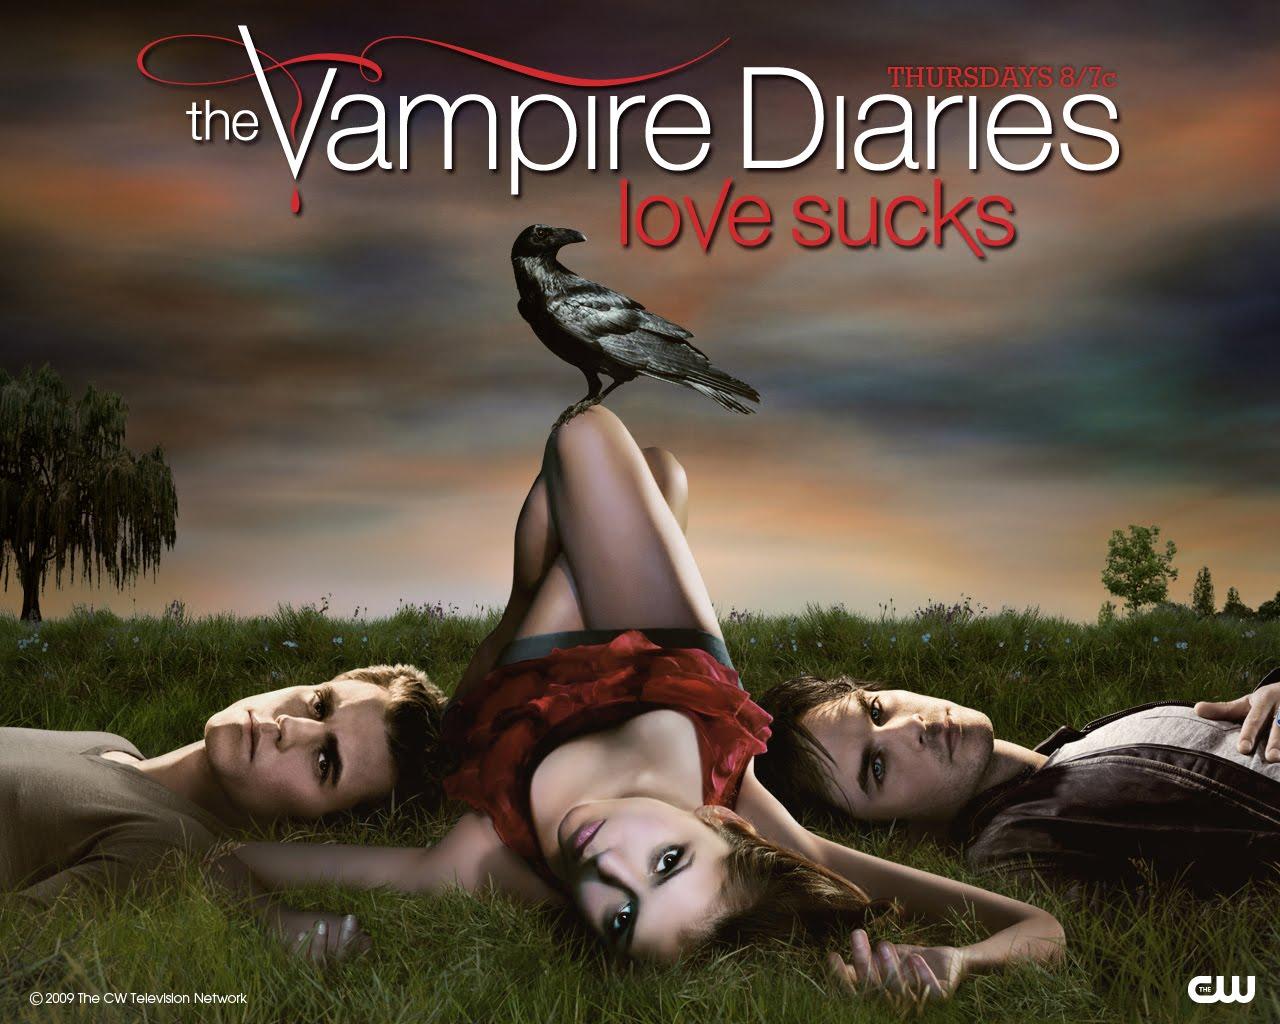 http://2.bp.blogspot.com/-C7bCR17ZXpI/TgOicTxjJvI/AAAAAAAADtM/NM27AvHXk4I/s1600/the-vampire-diaries-002.jpg